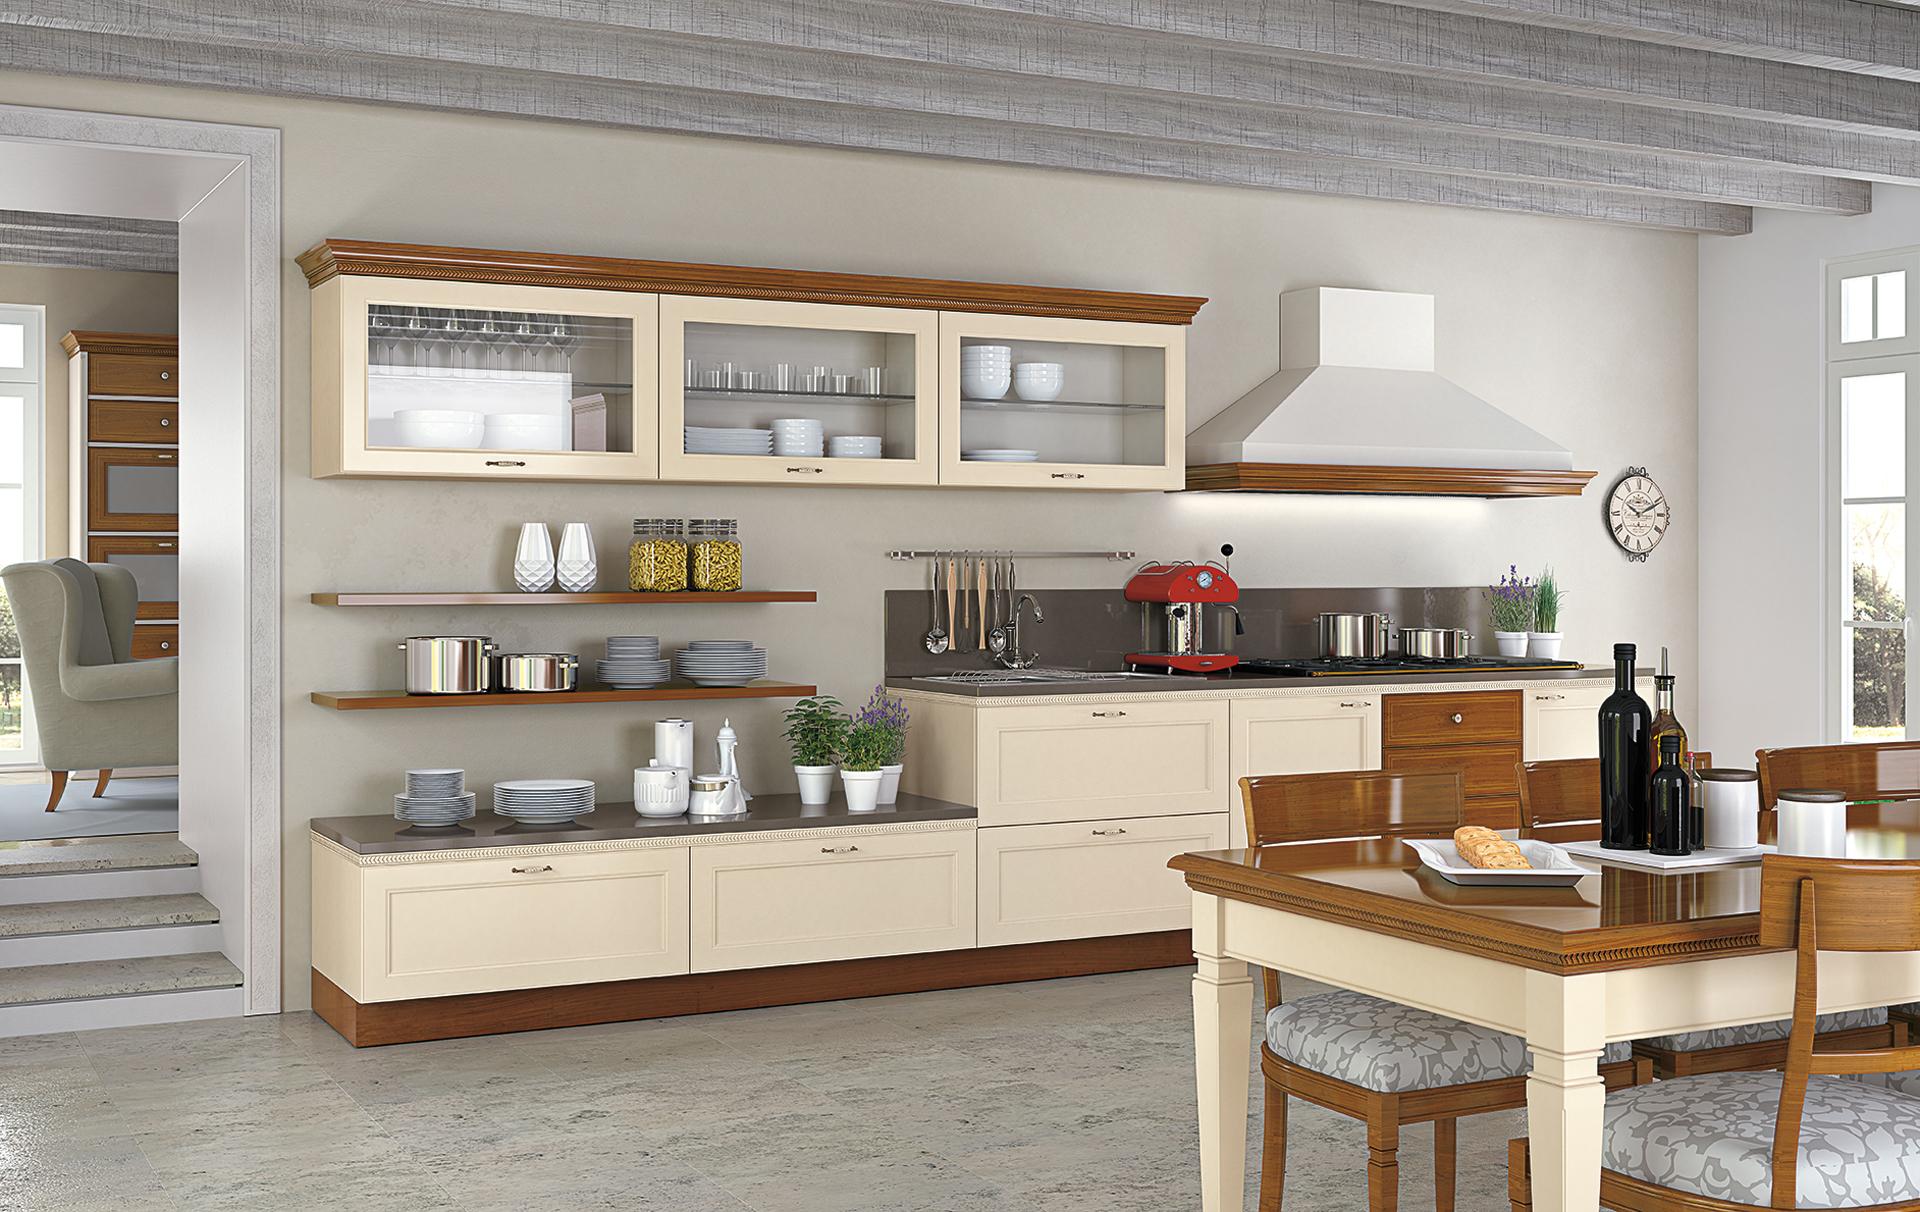 Cucina Bianca E Ciliegio cucina completa parete b. cucina classica ciliegio arredook